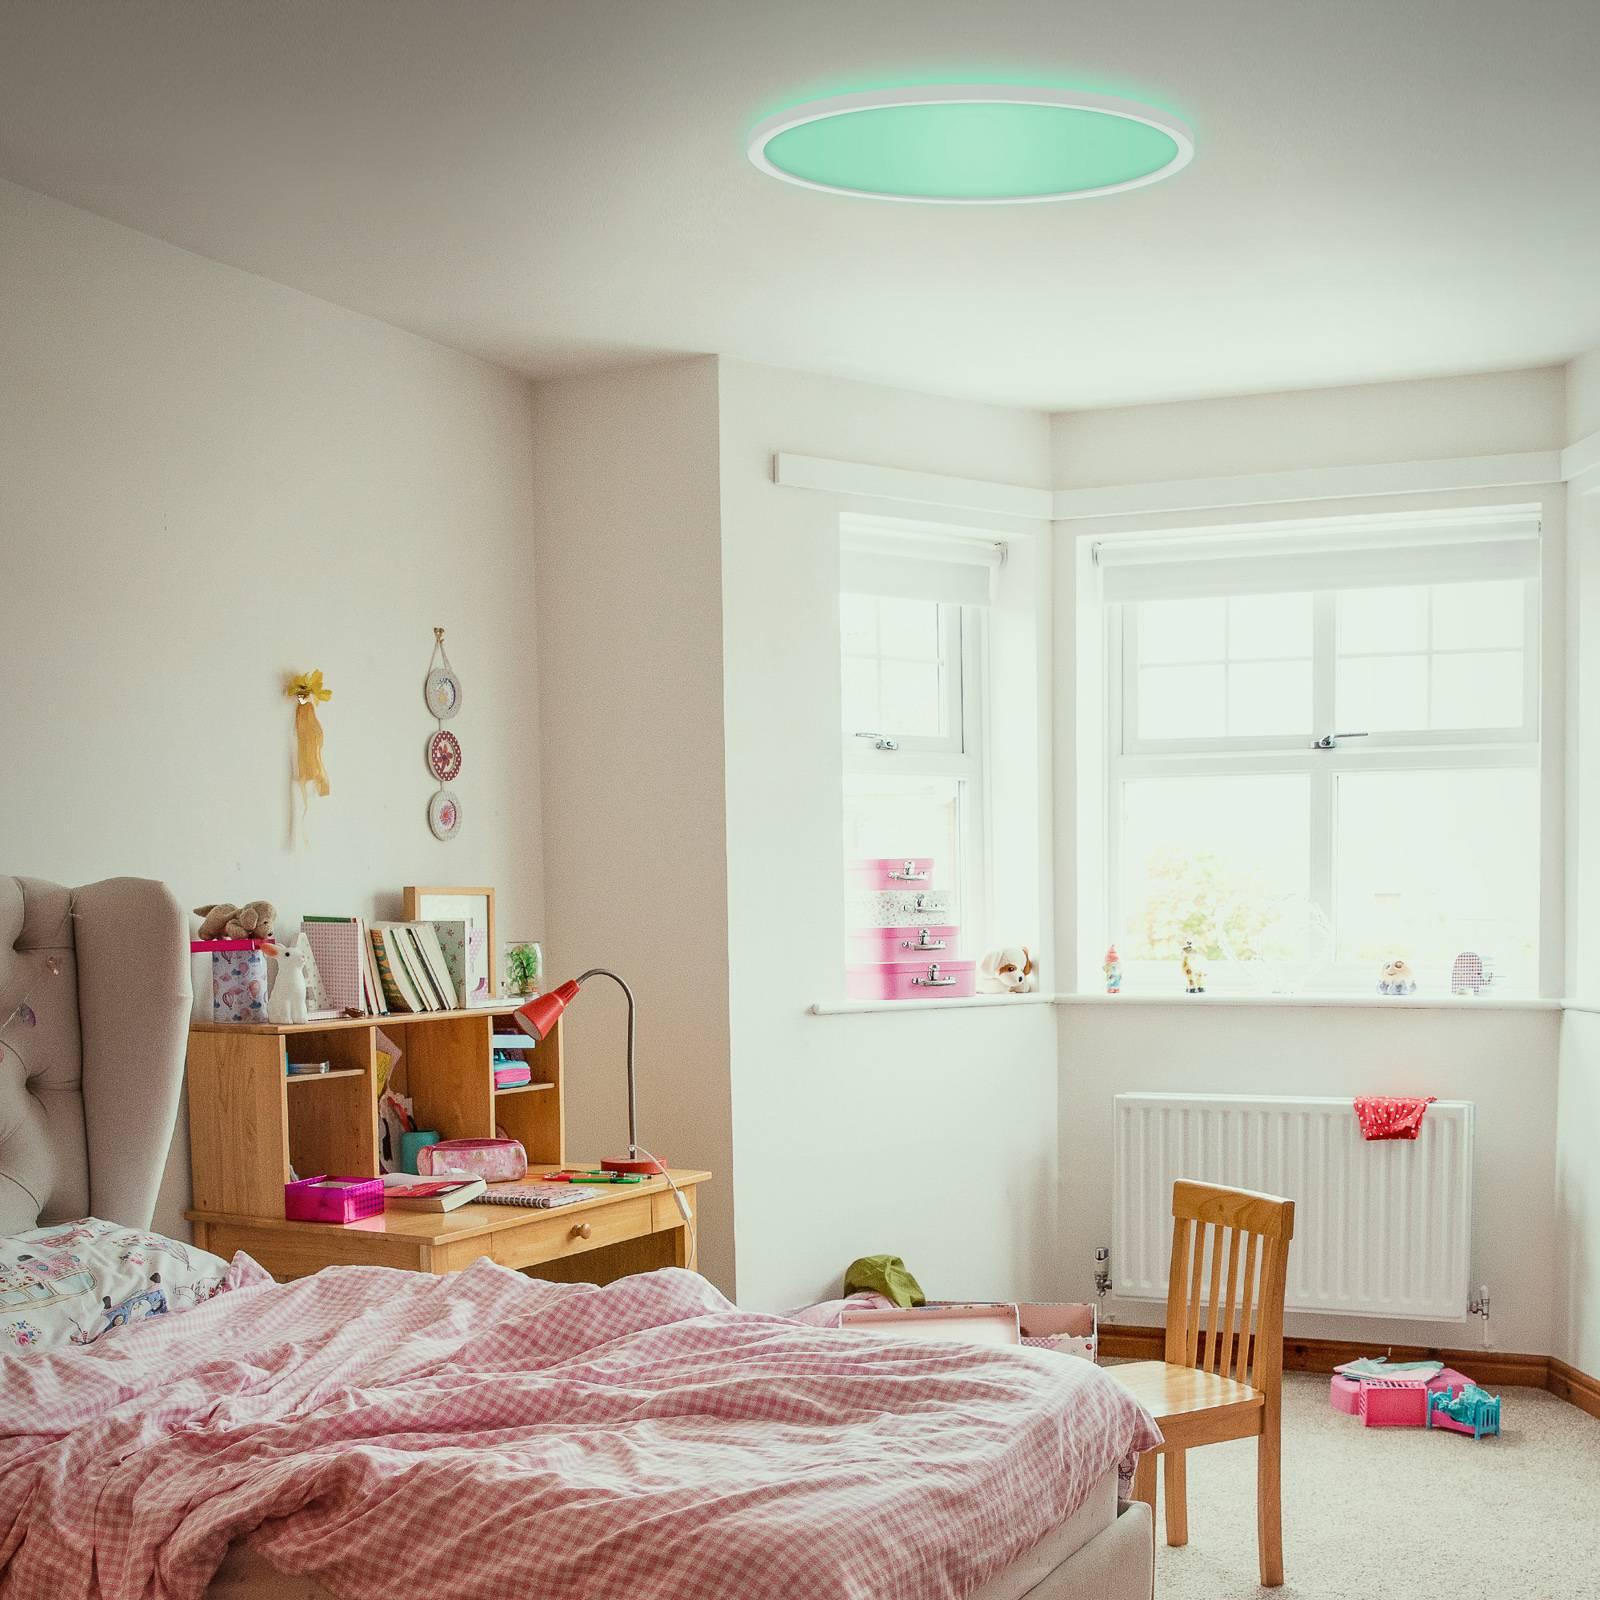 LED-paneeli Slim, ultraohut, pyöreä, RGB/W efekti